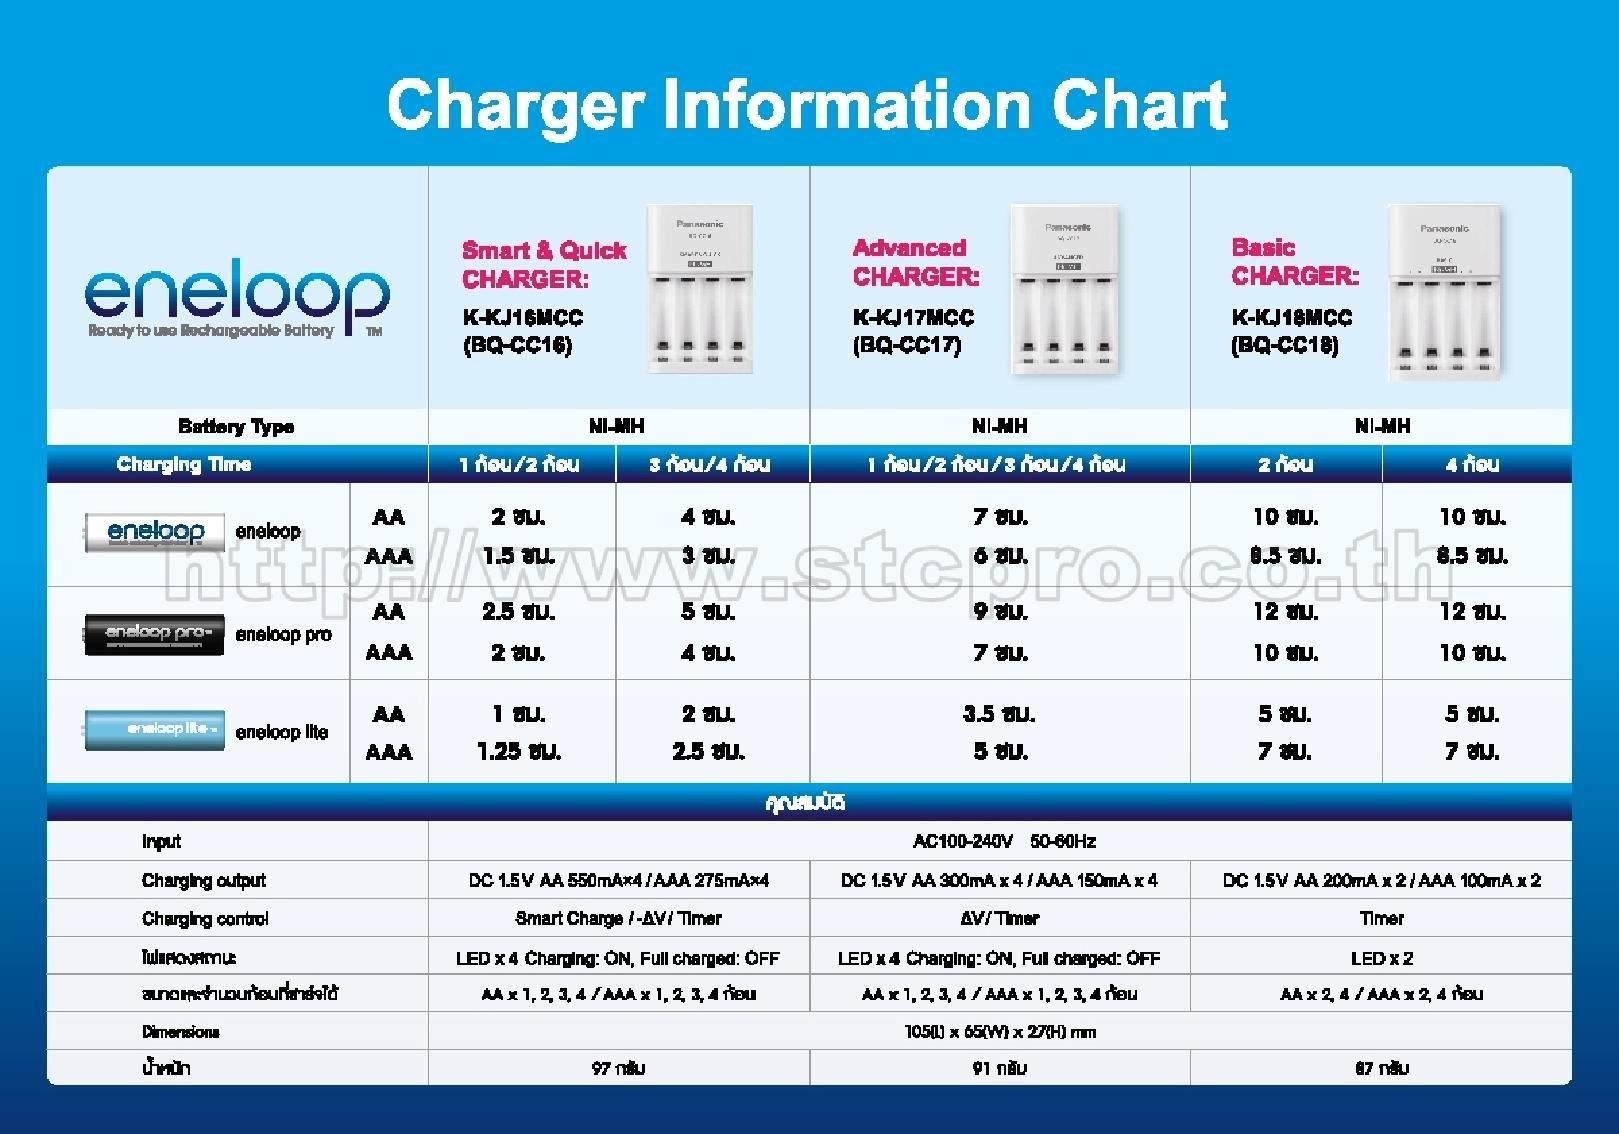 Eneloop Charger Comparison Chart